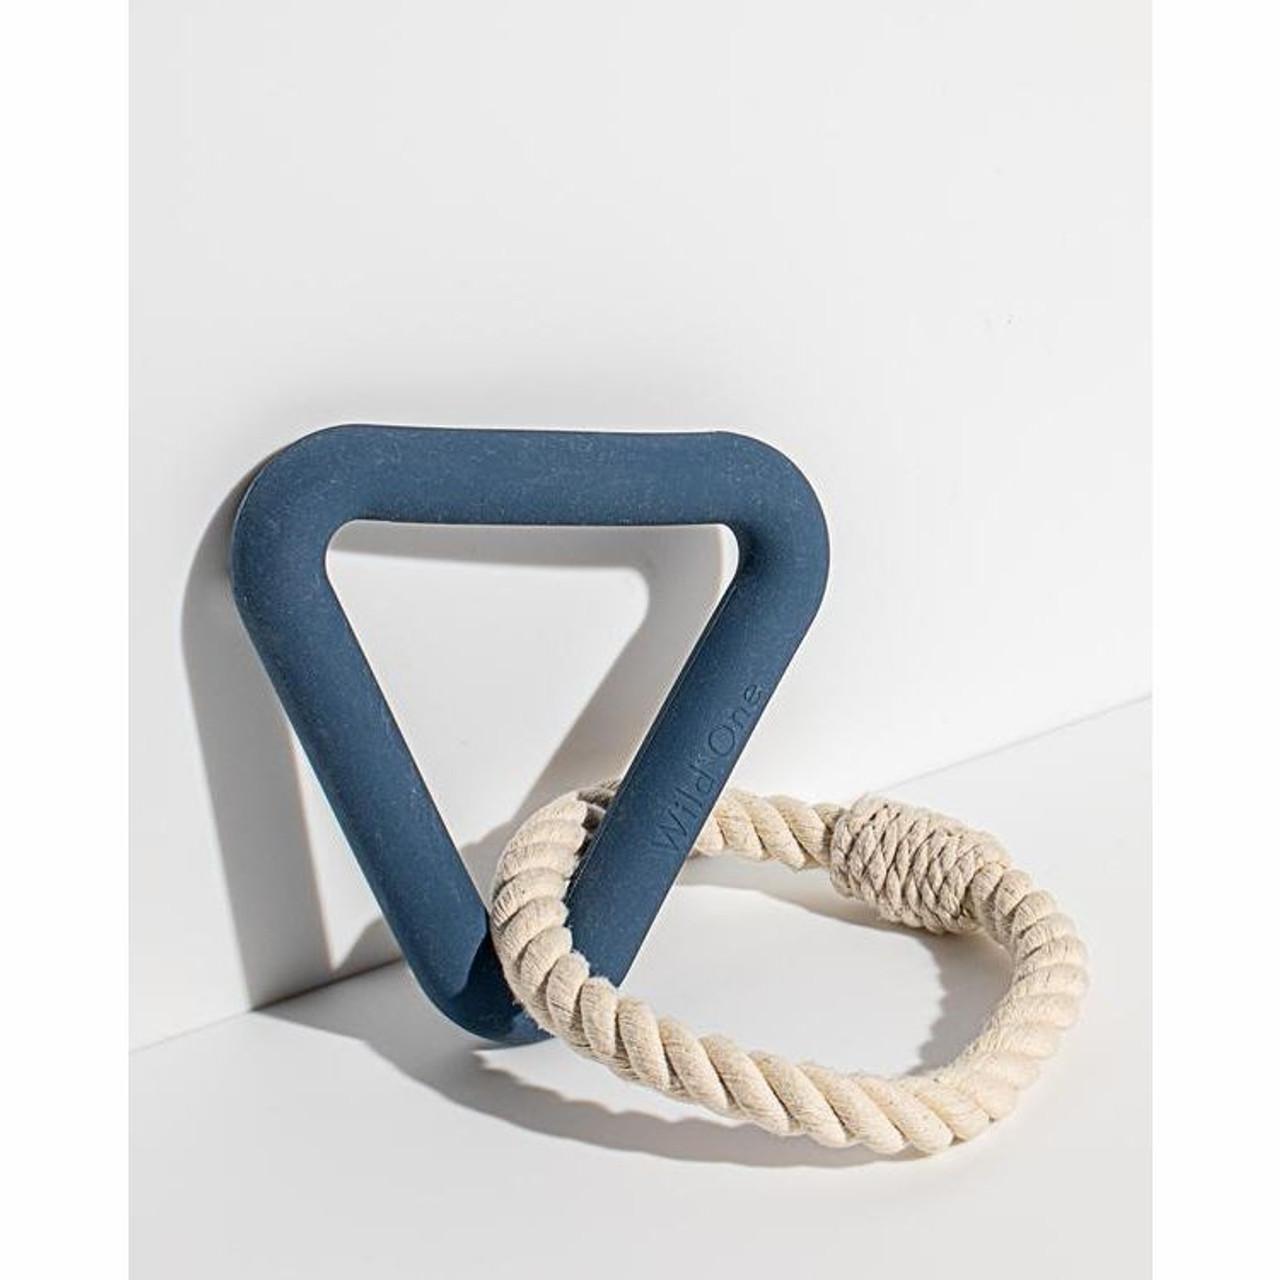 ild One - Eco-friendly Dog Toys - Triangle Tug - Navy